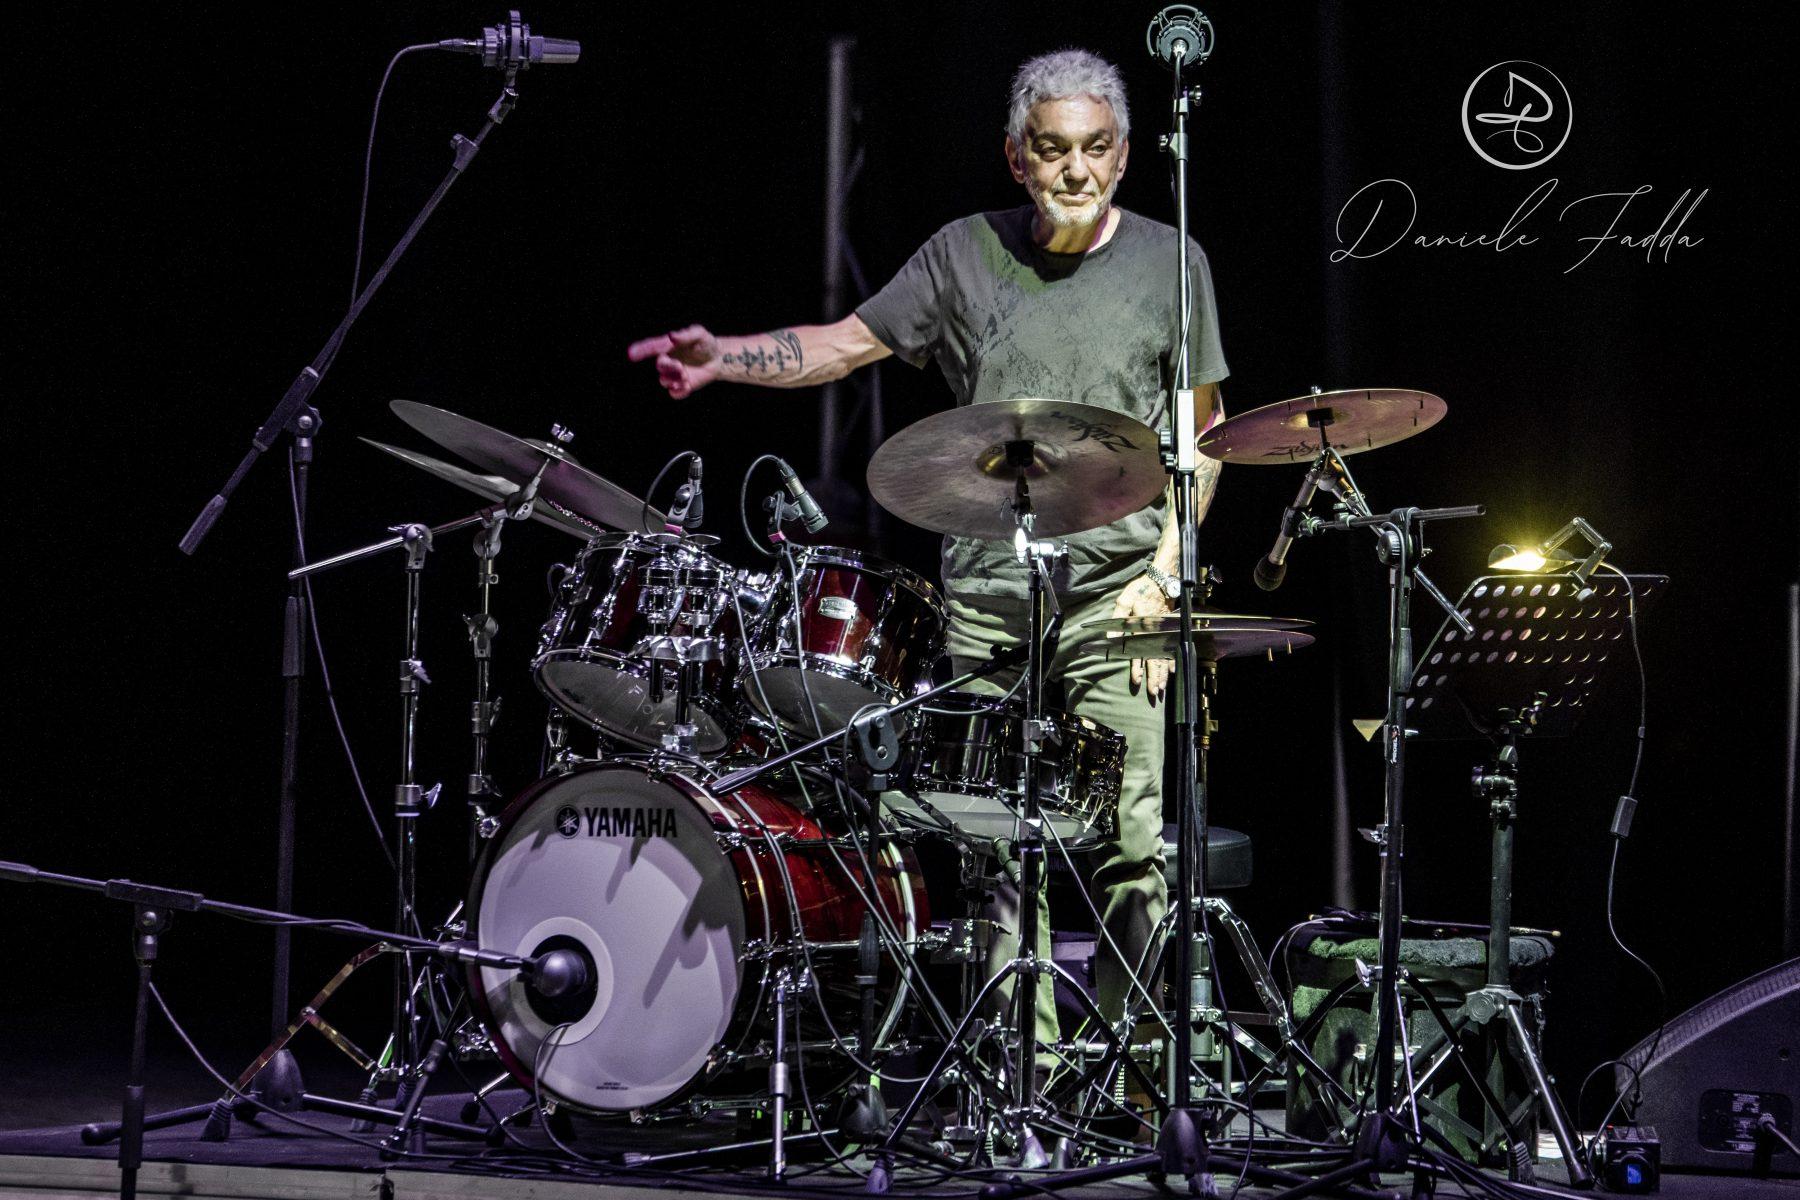 European Jazz Expo - Michael Blicher, Dan Hemmer, Steve Gadd - Blicher-Hemmer-Gadd - Daniele Fadda - 2019 - Sa Scena Sarda - 2 Novembre